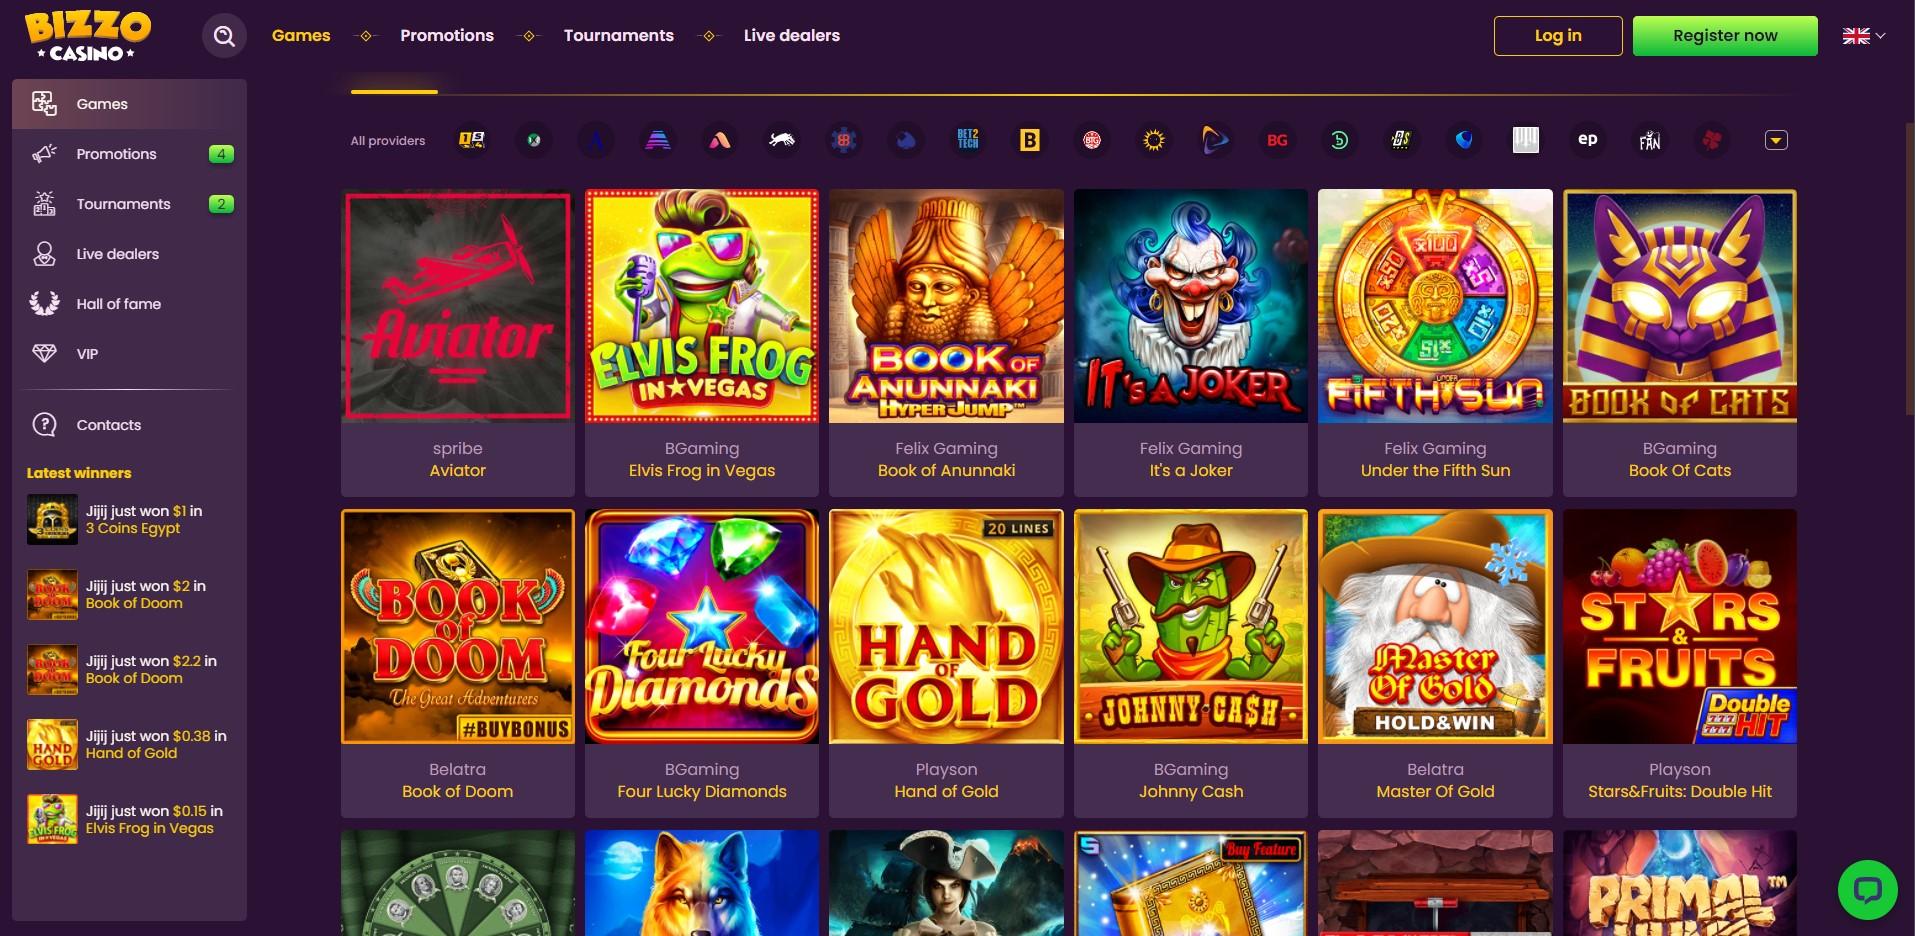 Games at Bizzo Casino